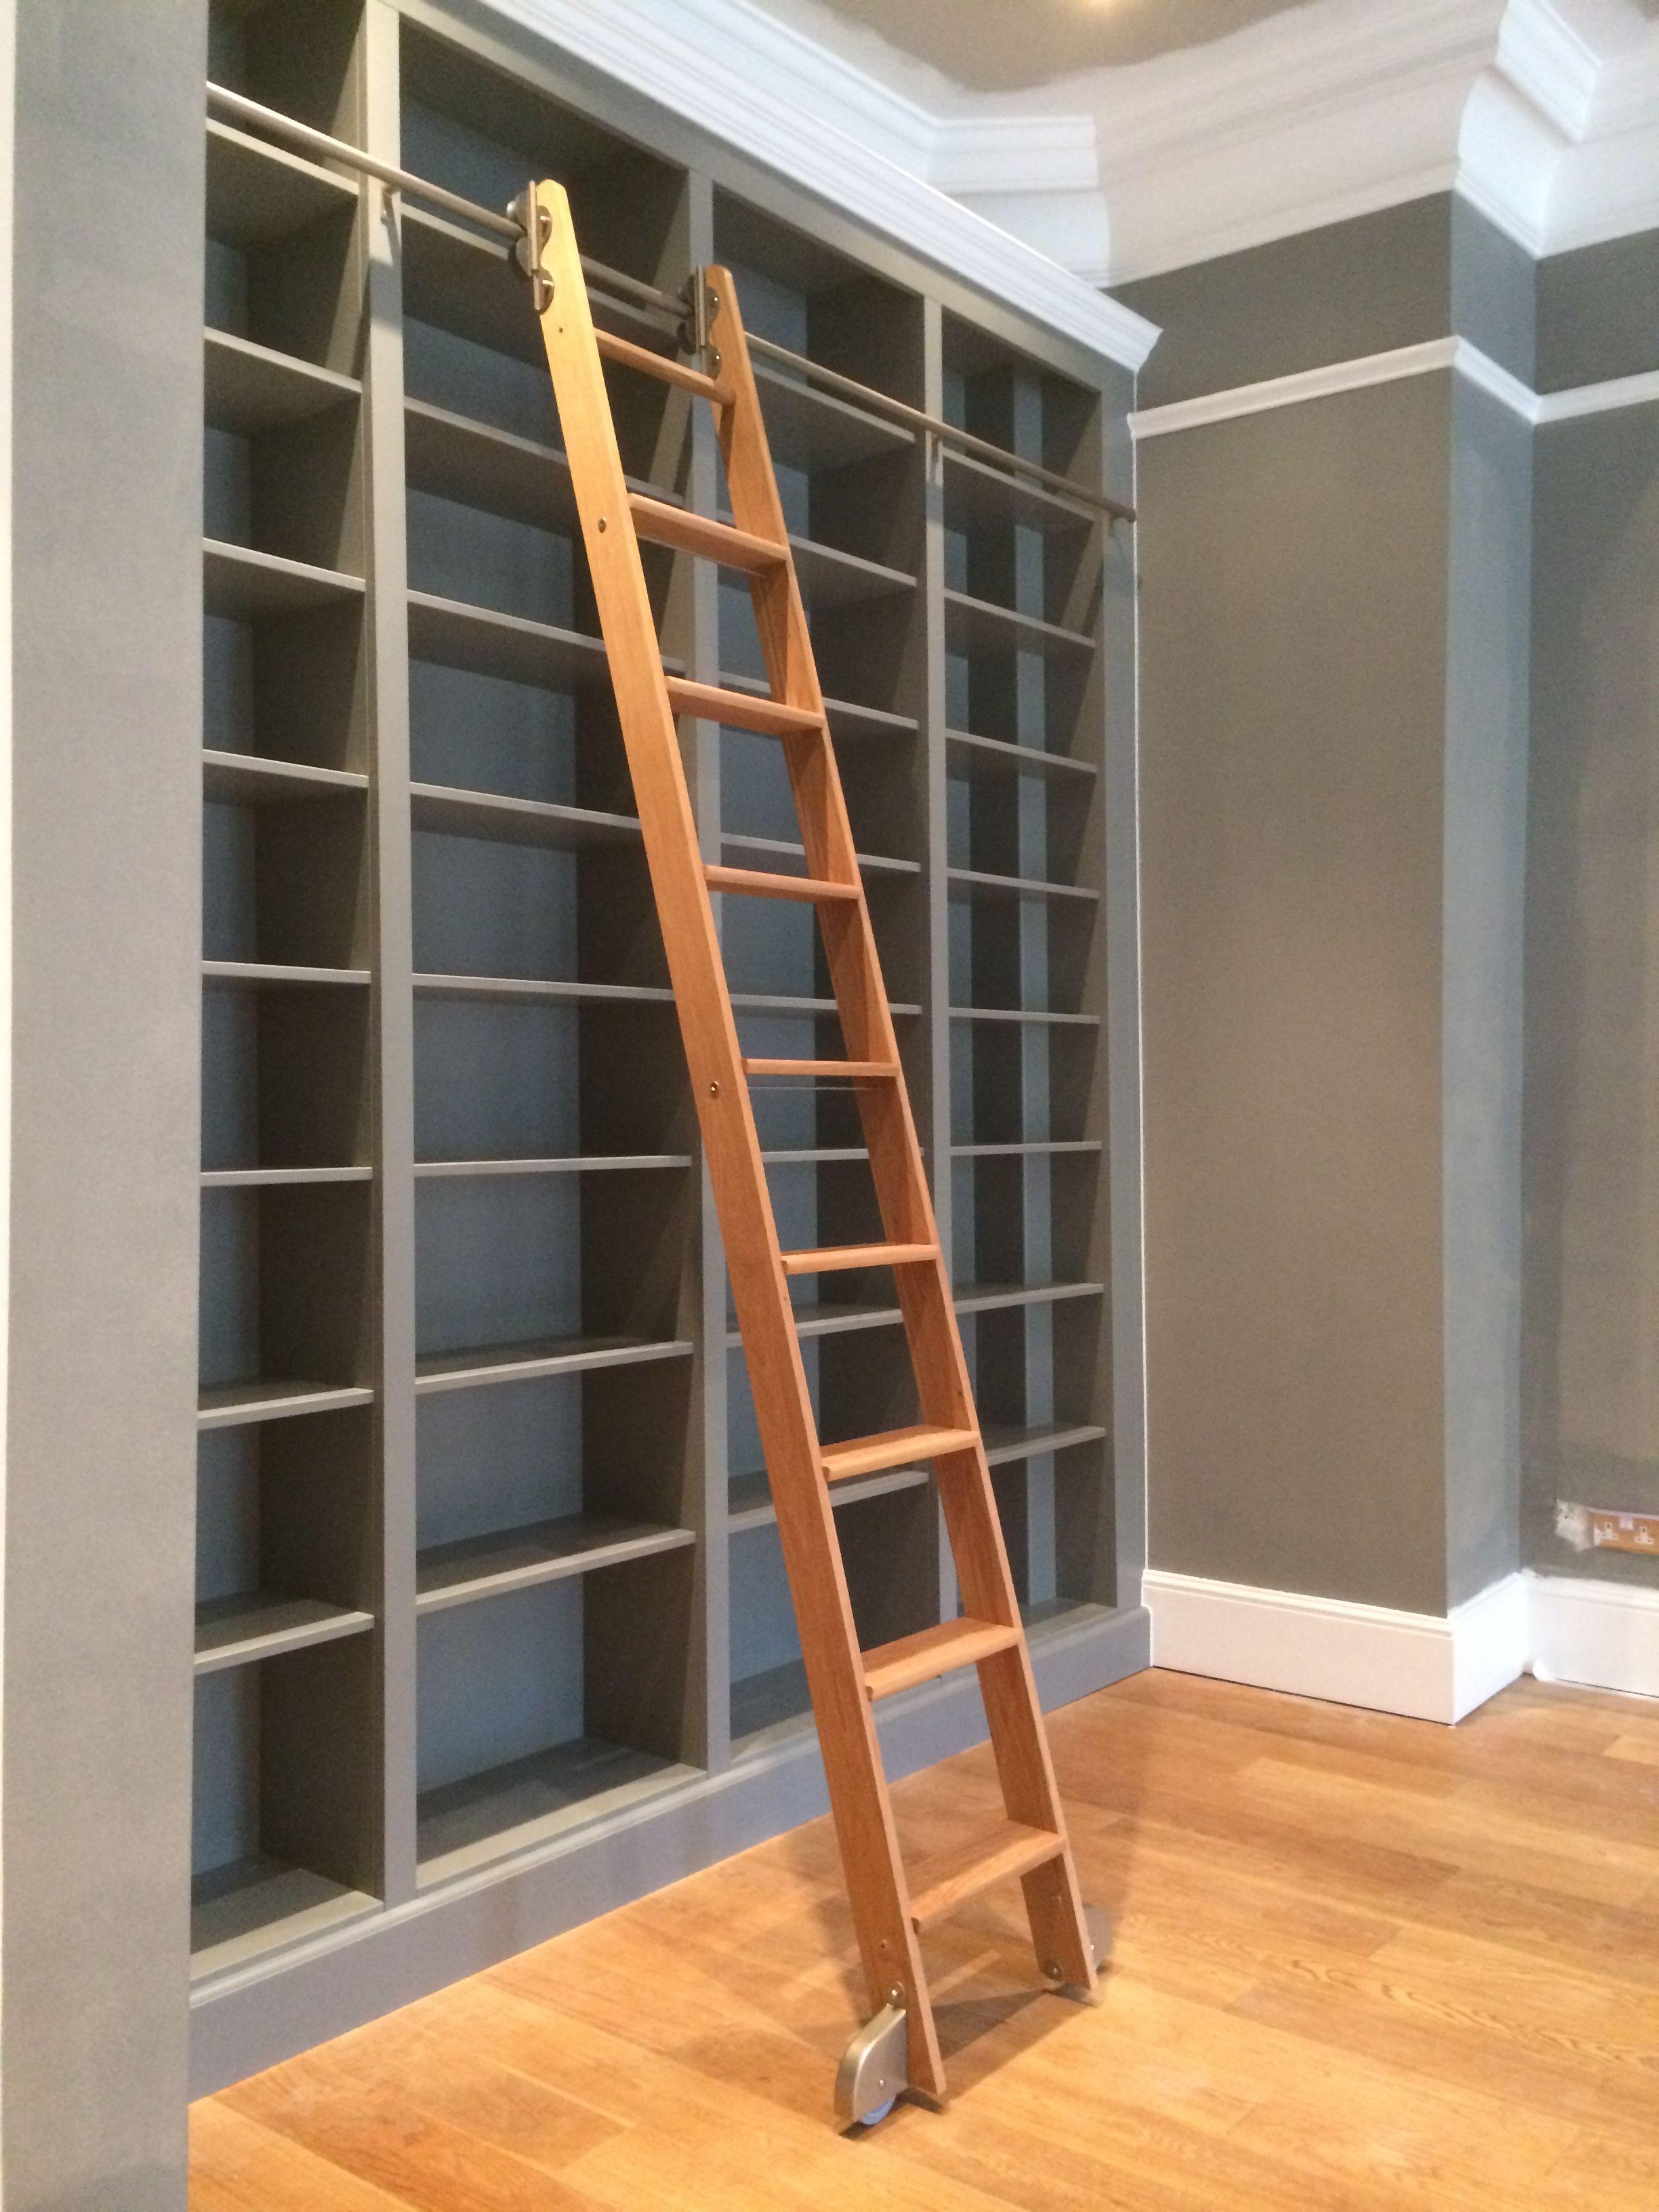 Large Bespoke Bookcase With A Sliding Oak Ladder Images Show